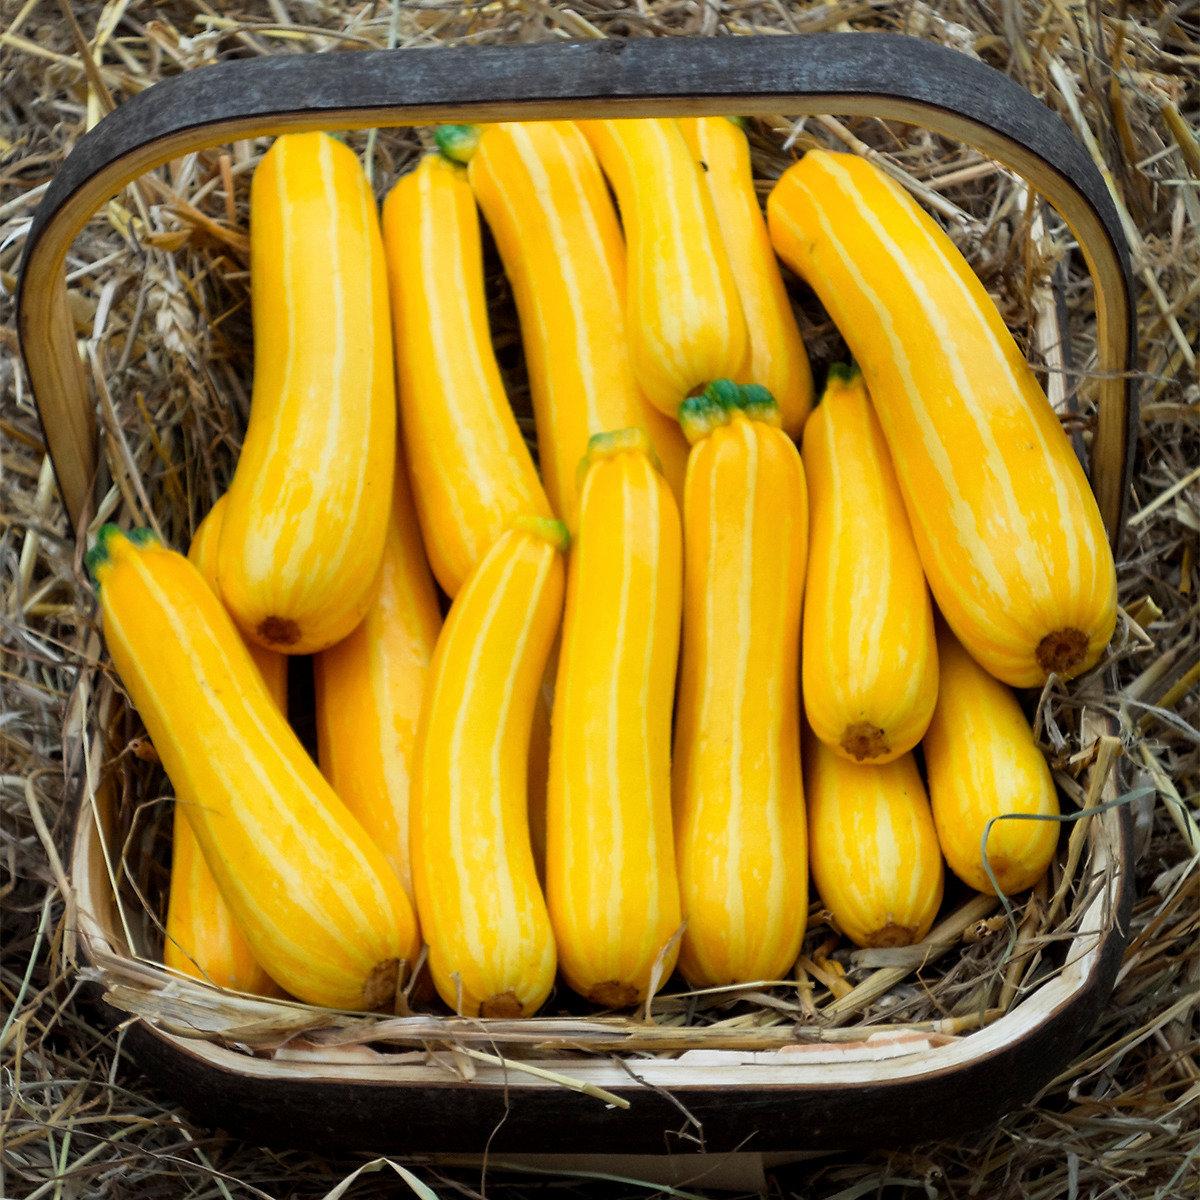 Zucchinisamen Sunstripe F1 | #2